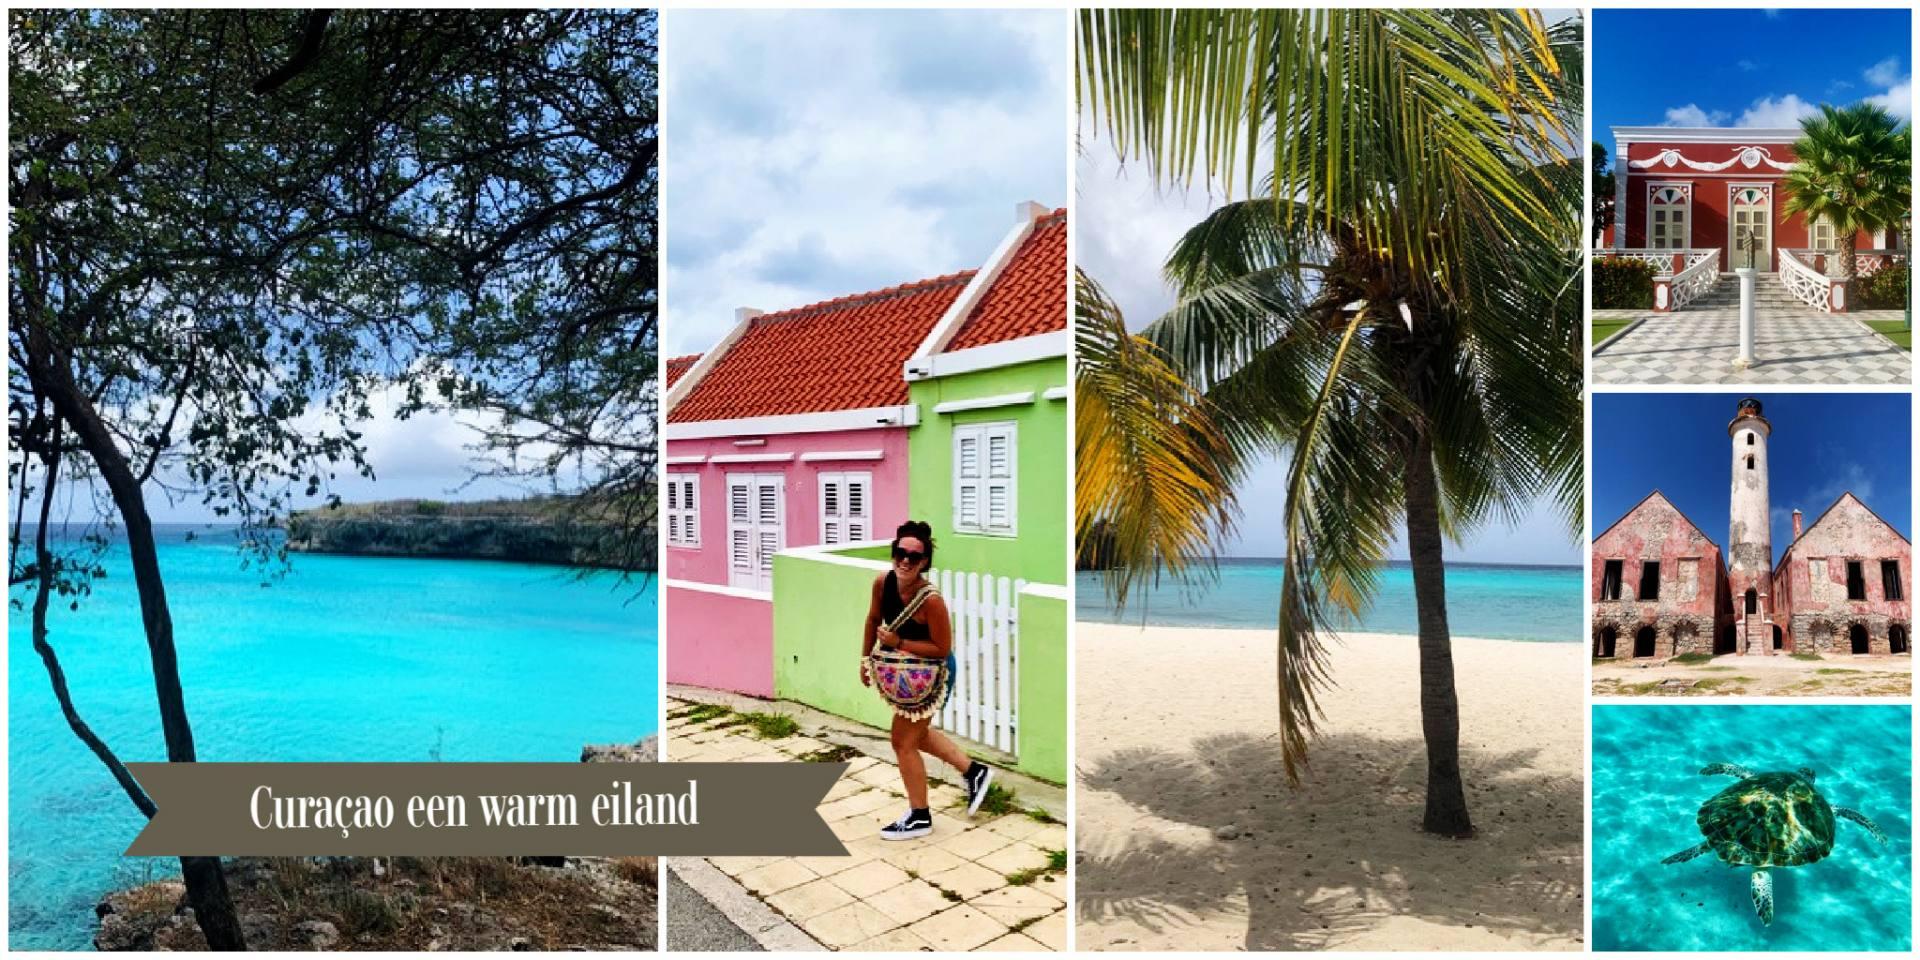 Curaçao (Dushi Korsou) een warm eiland